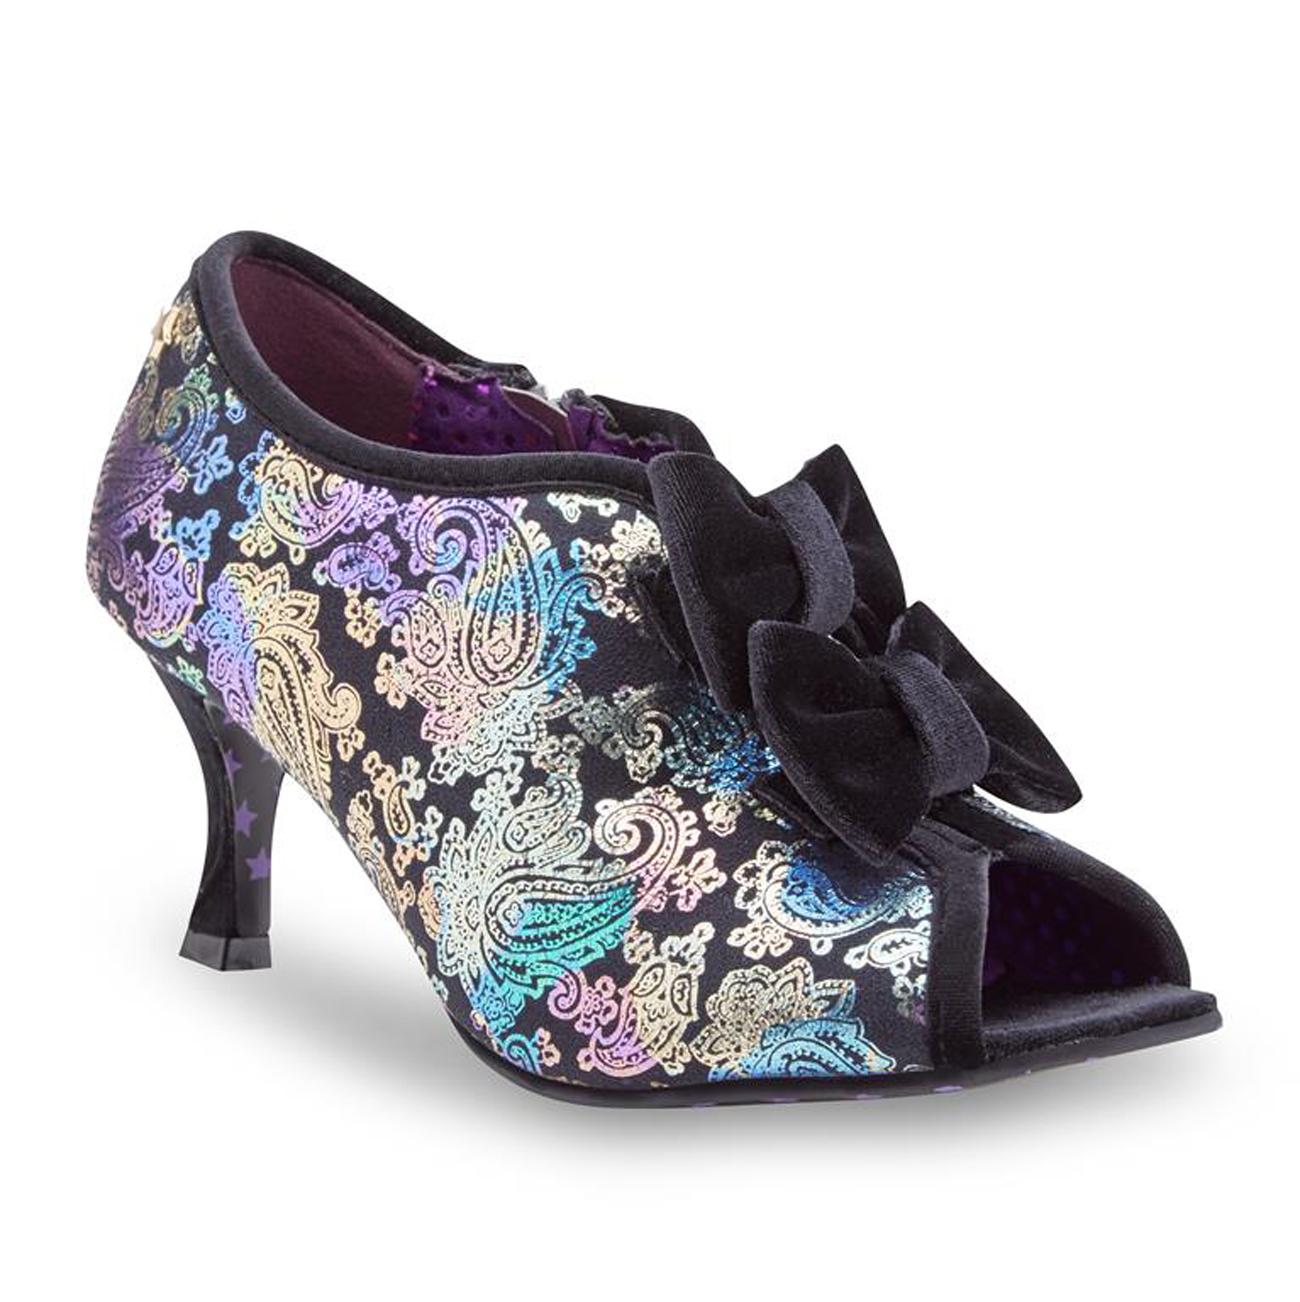 Joe Browns Couture Ladies Lace Bar Shoe Womens Party Shoes